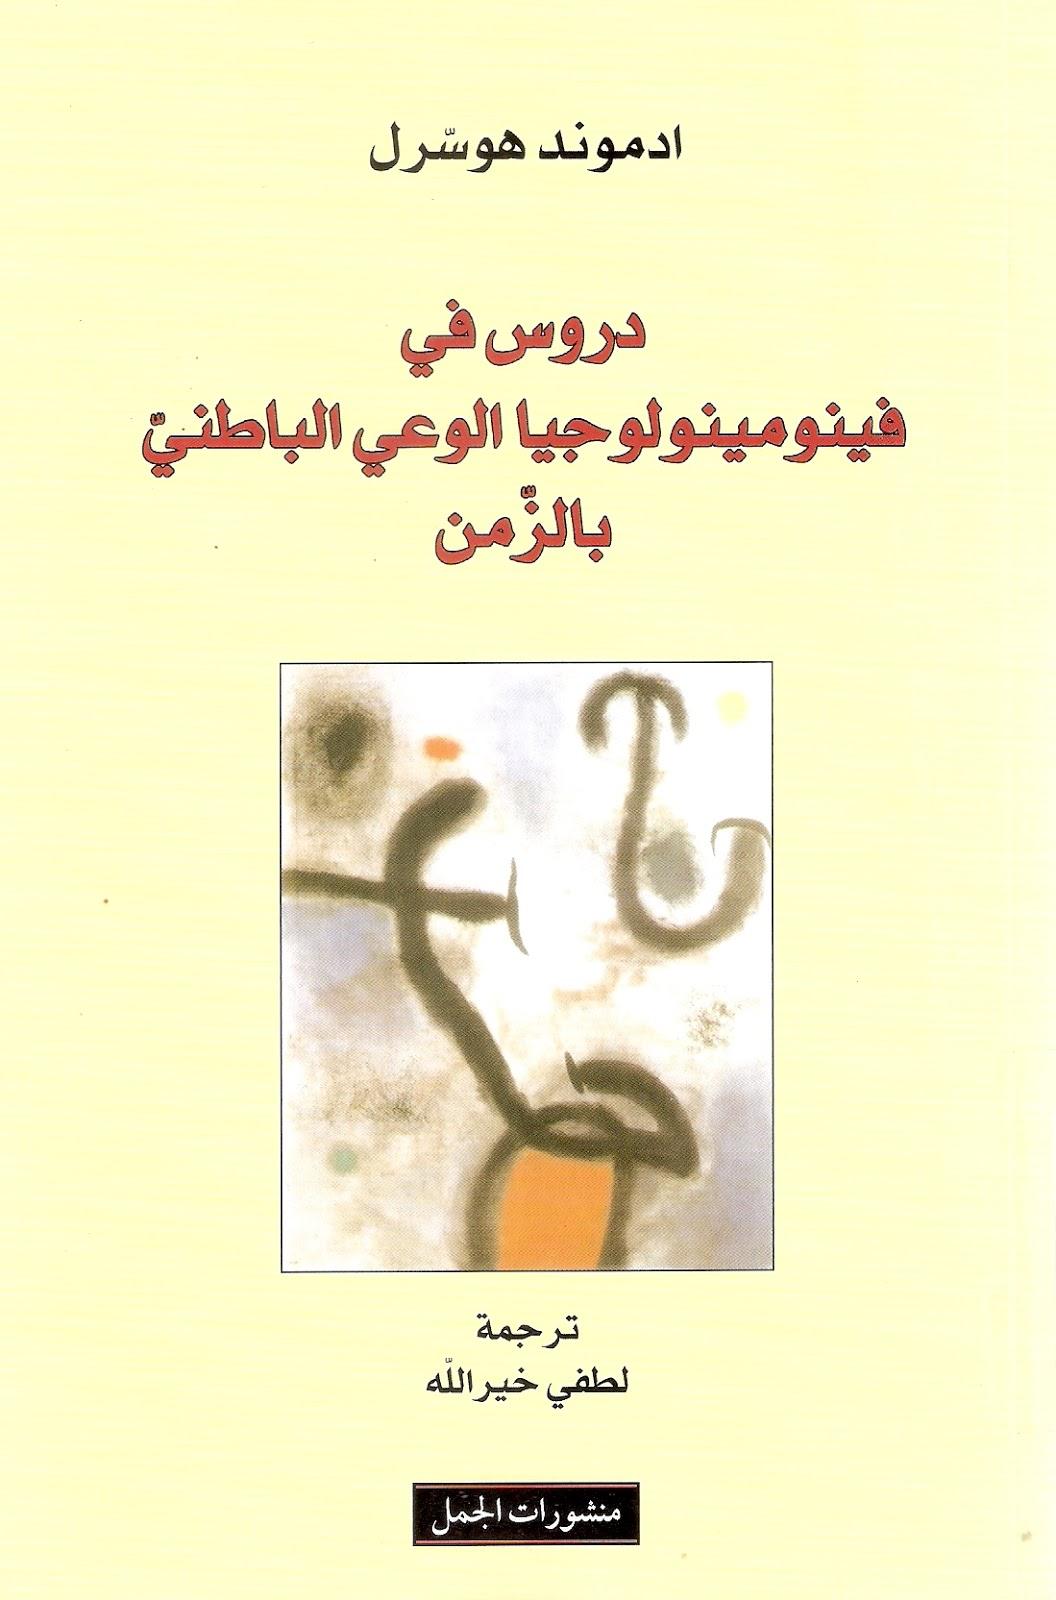 c2caf pages2bde2b00001 - تحميل كتاب دروس في فينومينولوجيا الوعي الباطني بالزمن pdf لـ ادموند هوسرل